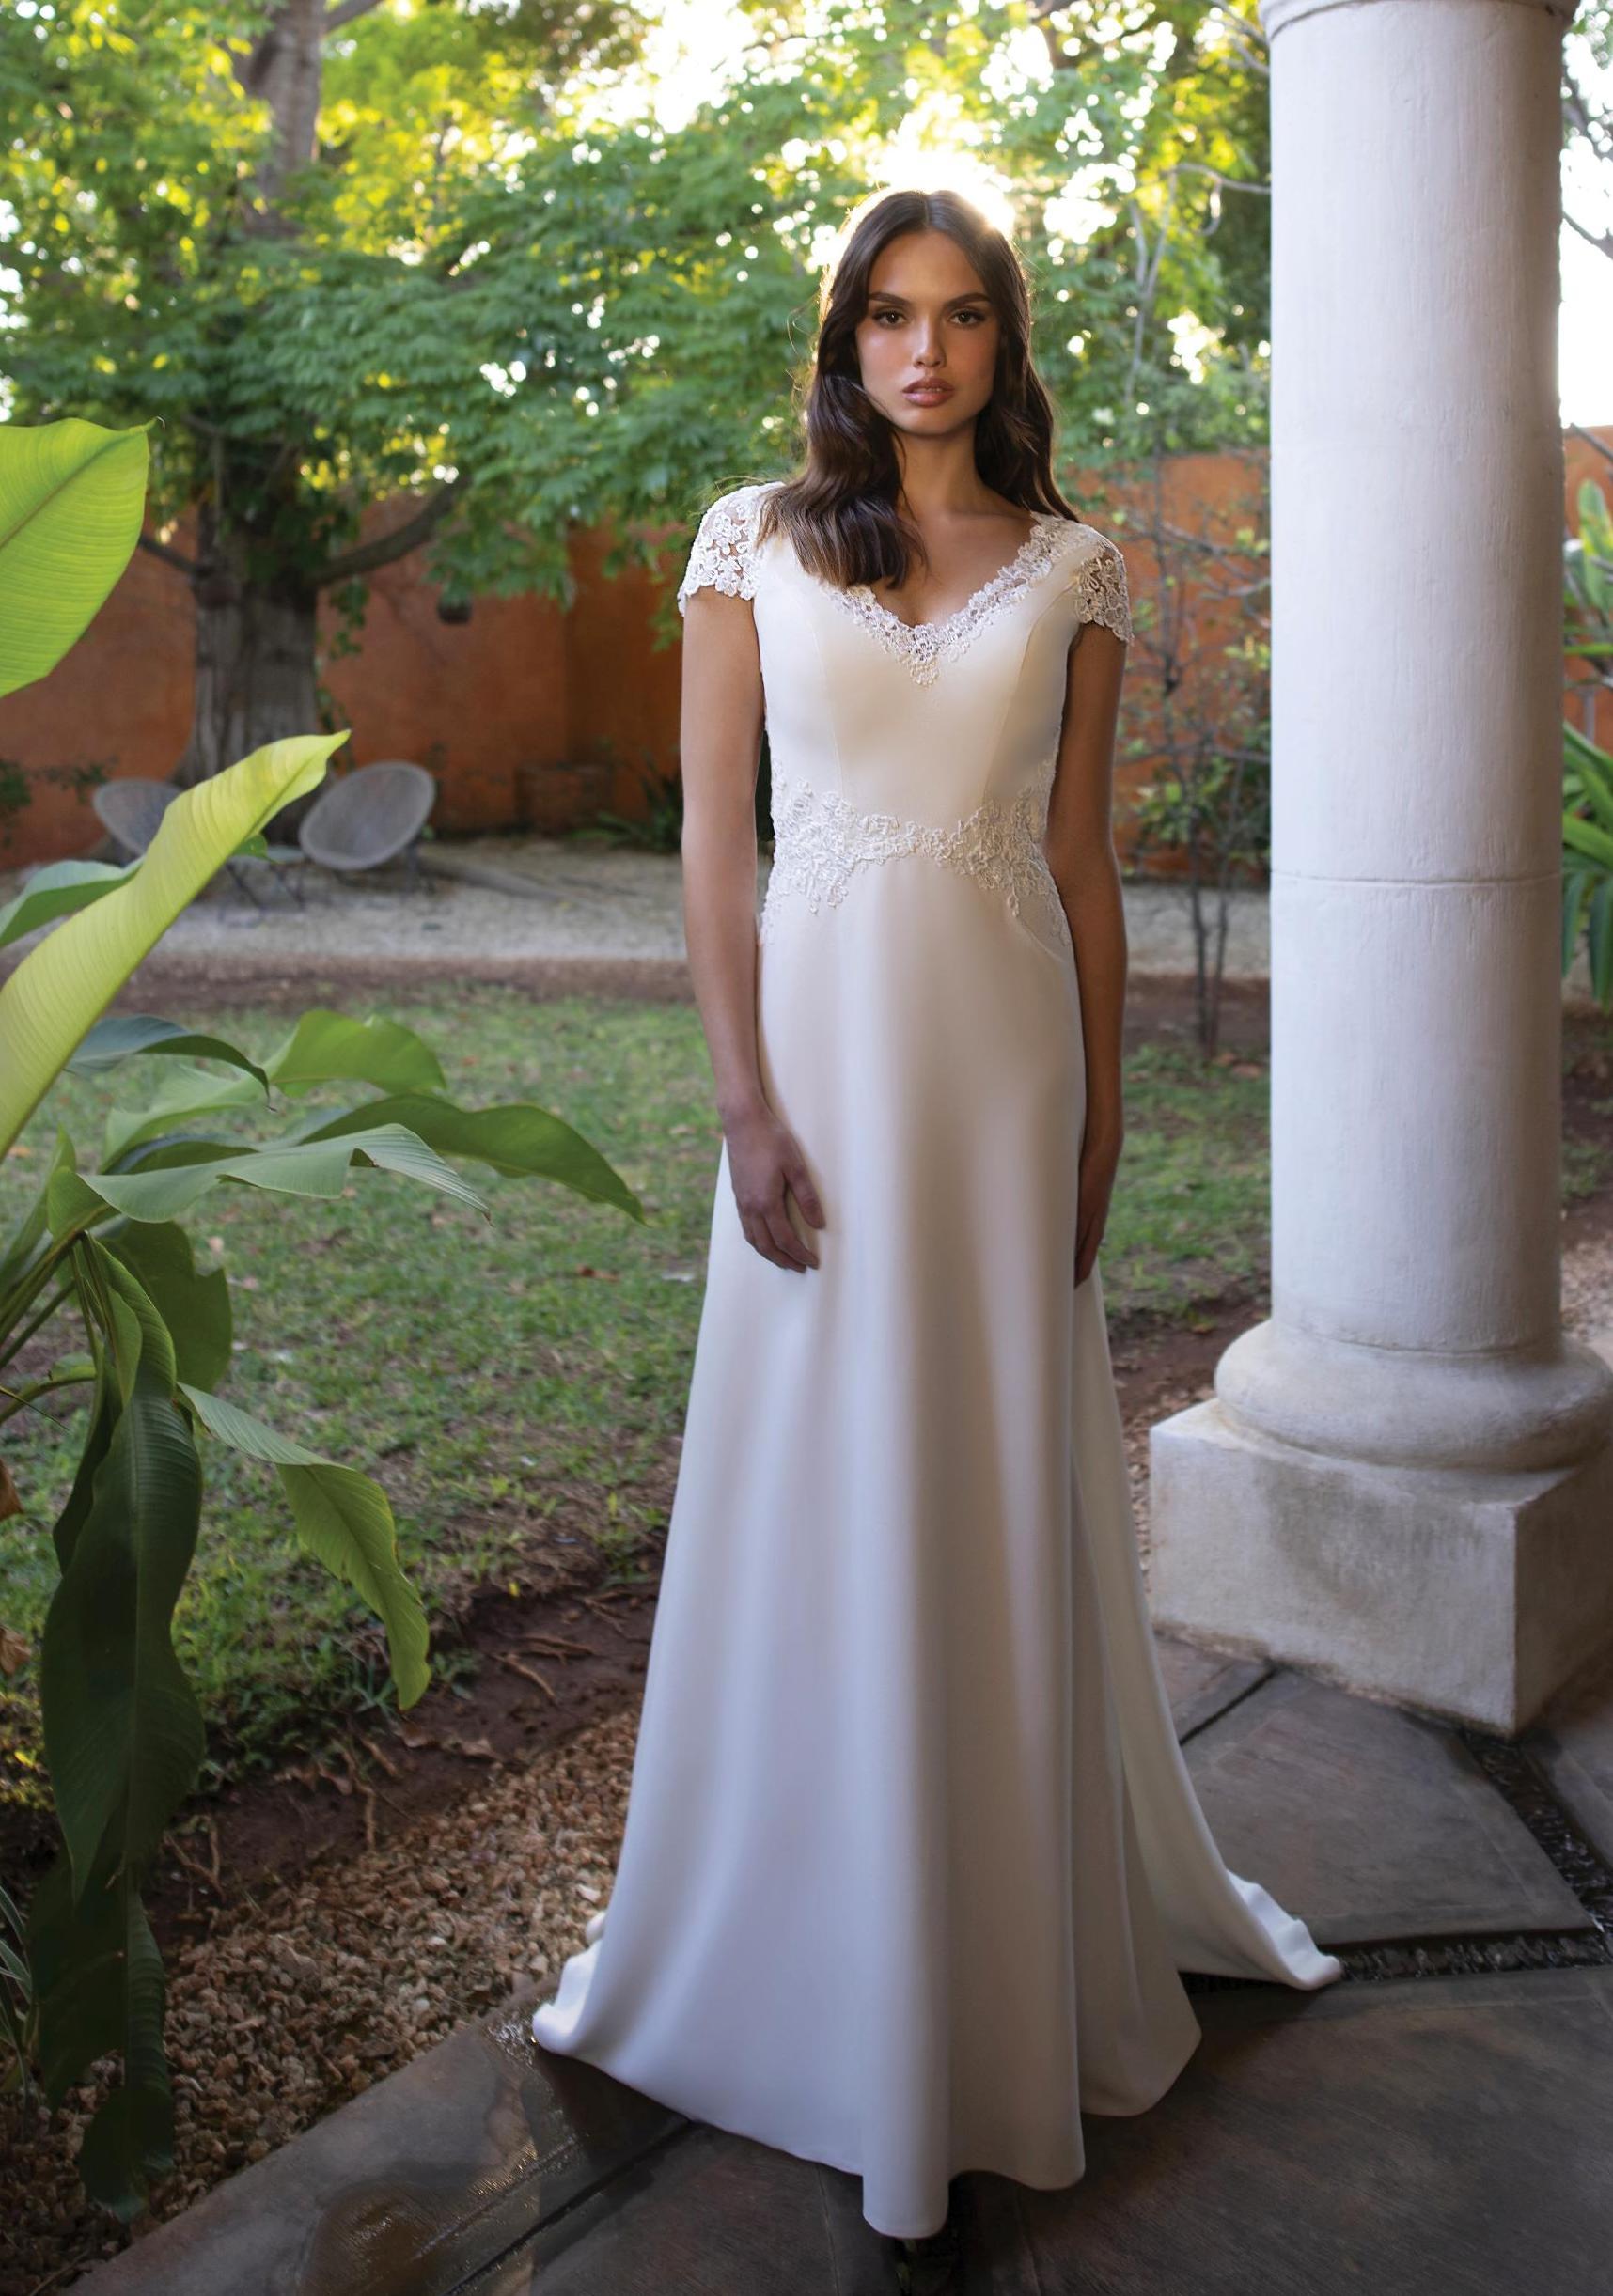 Robes de mariée BO'M 114 : 729€